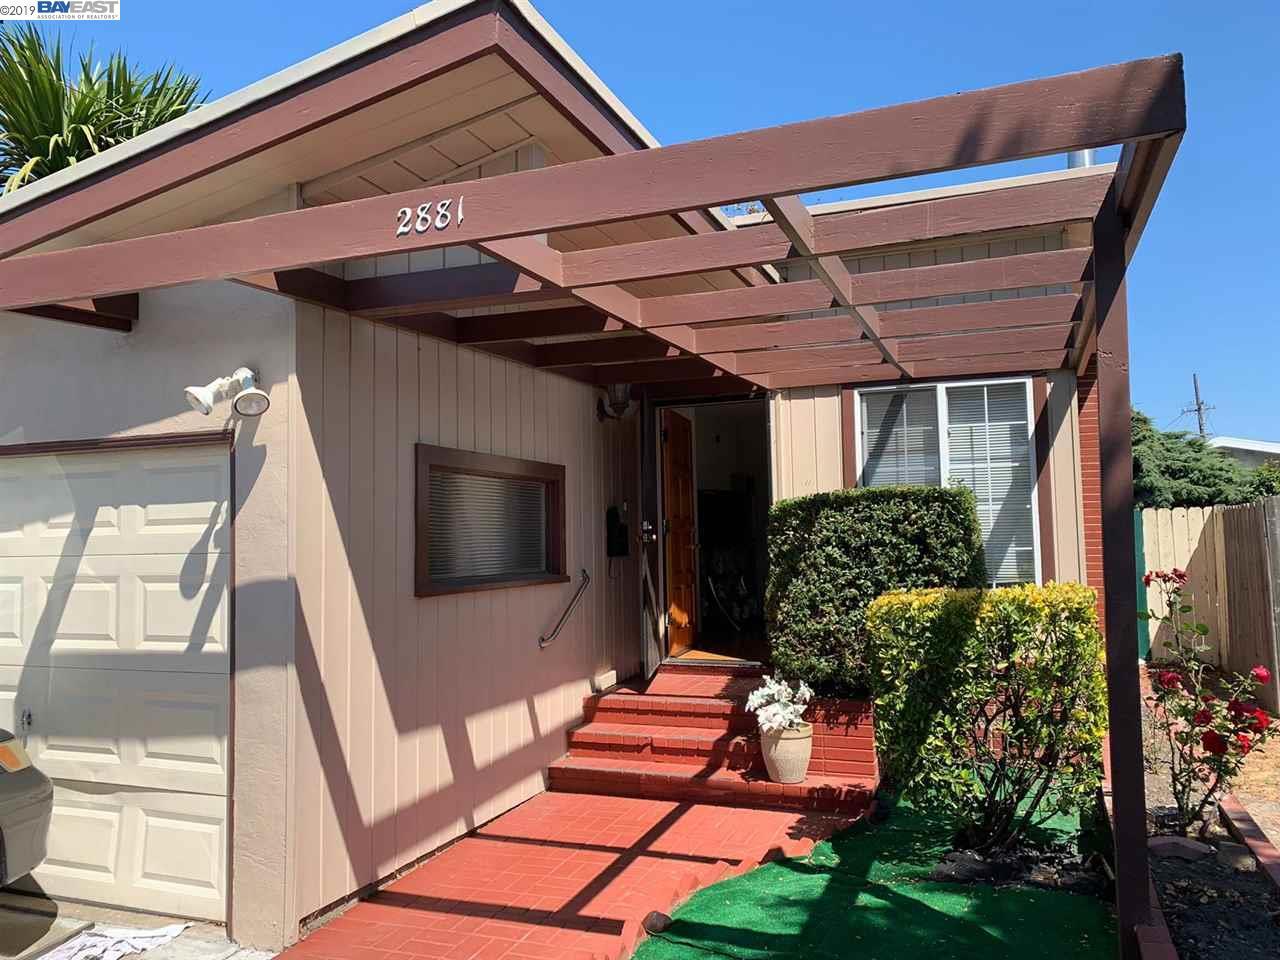 2881 GARVIN AVE, RICHMOND, CA 94804